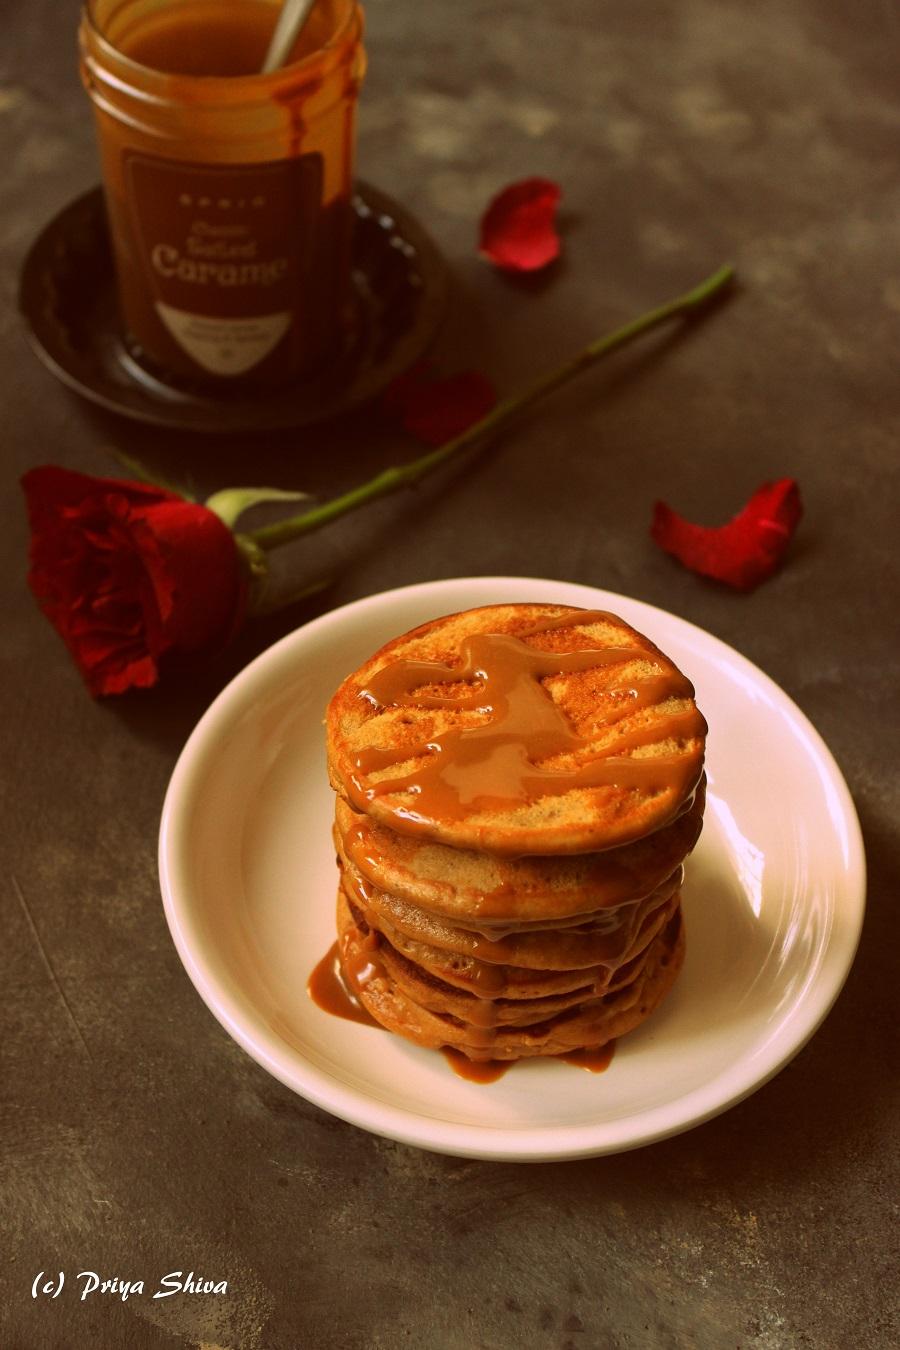 Salted Caramel Coconut Banana Pancakes